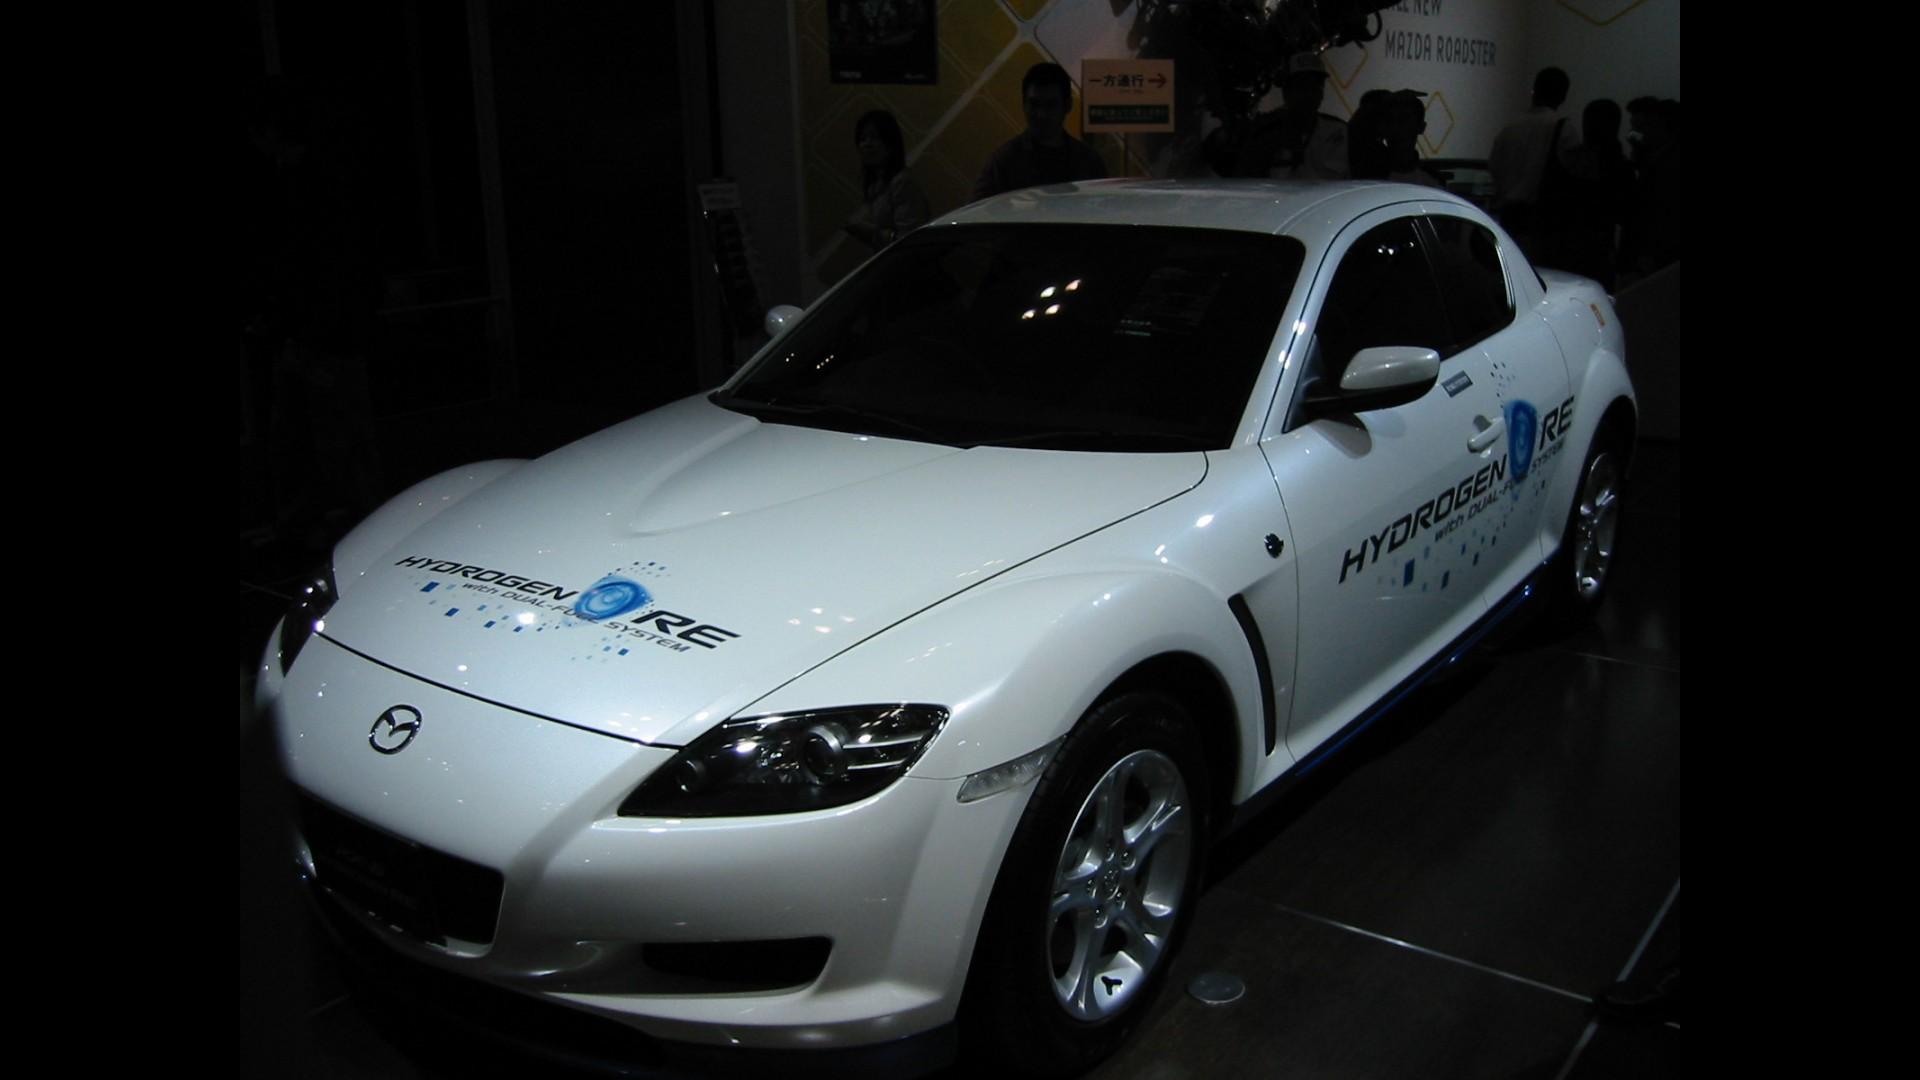 https://icdn-5.motor1.com/images/mgl/M9gP8/s1/mazda-rx-8-hydrogen-concept.jpg